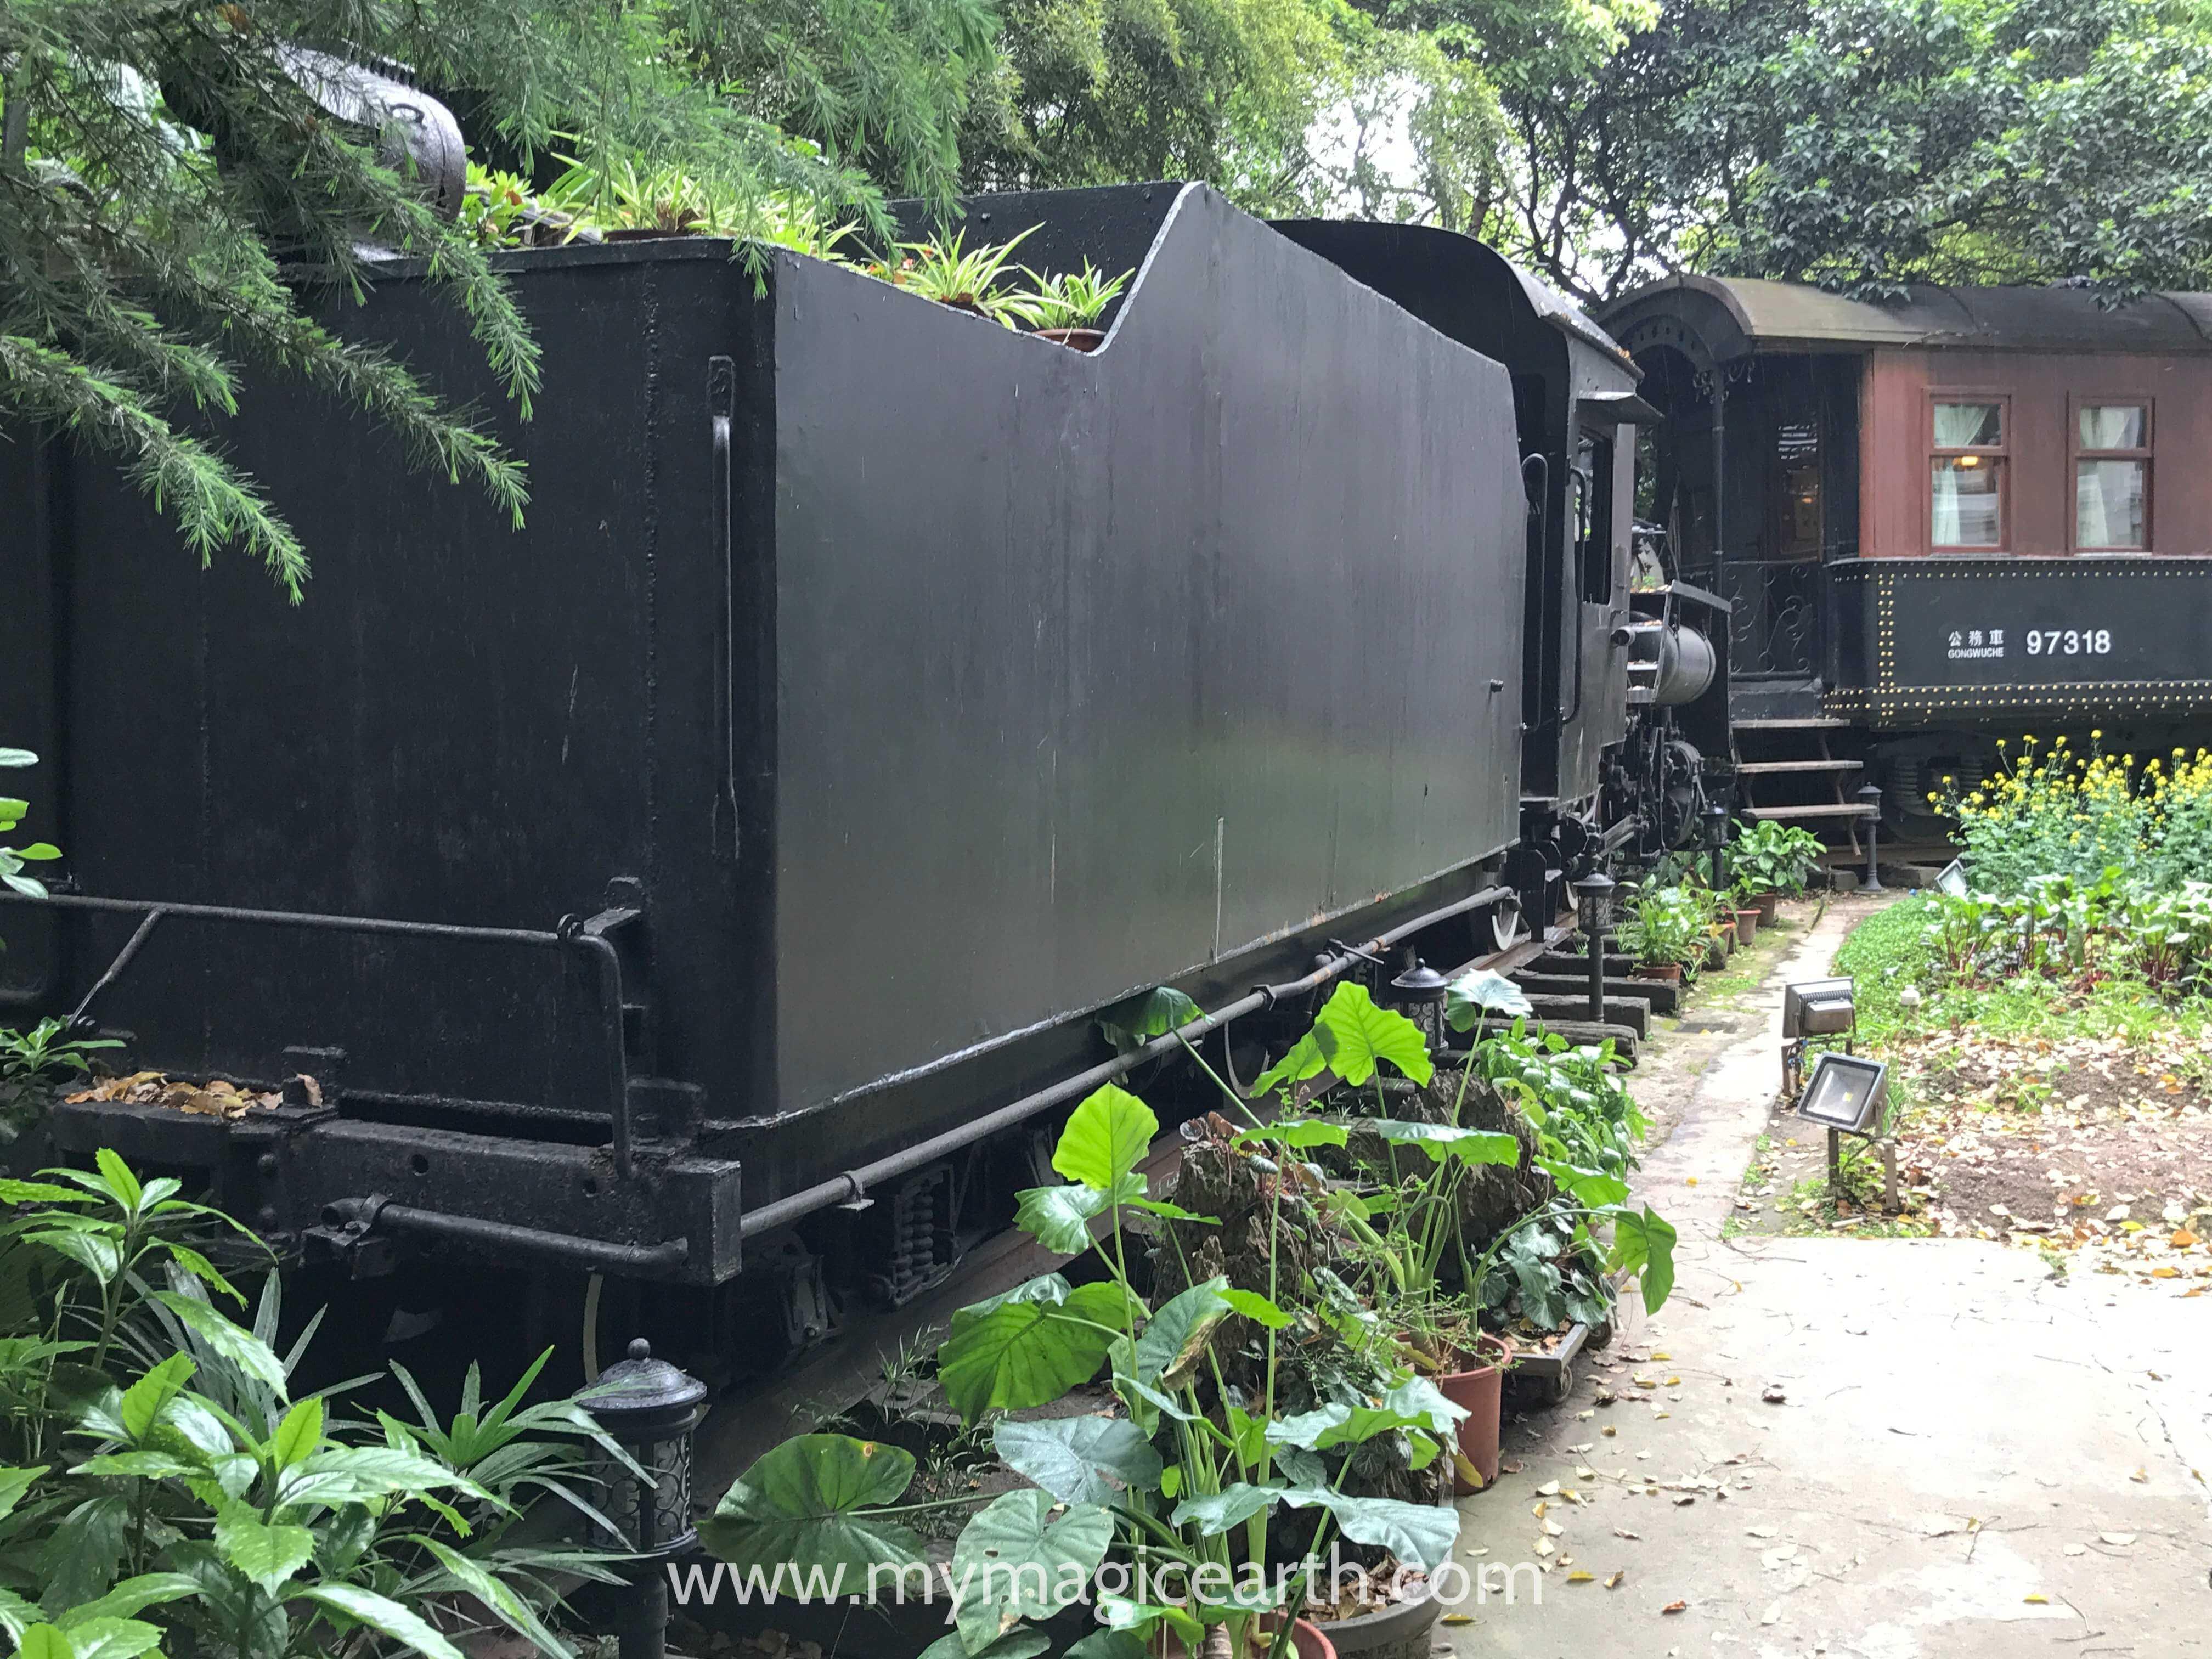 C4 narrow-gauge locomotive (C4窄轨蒸汽机车)